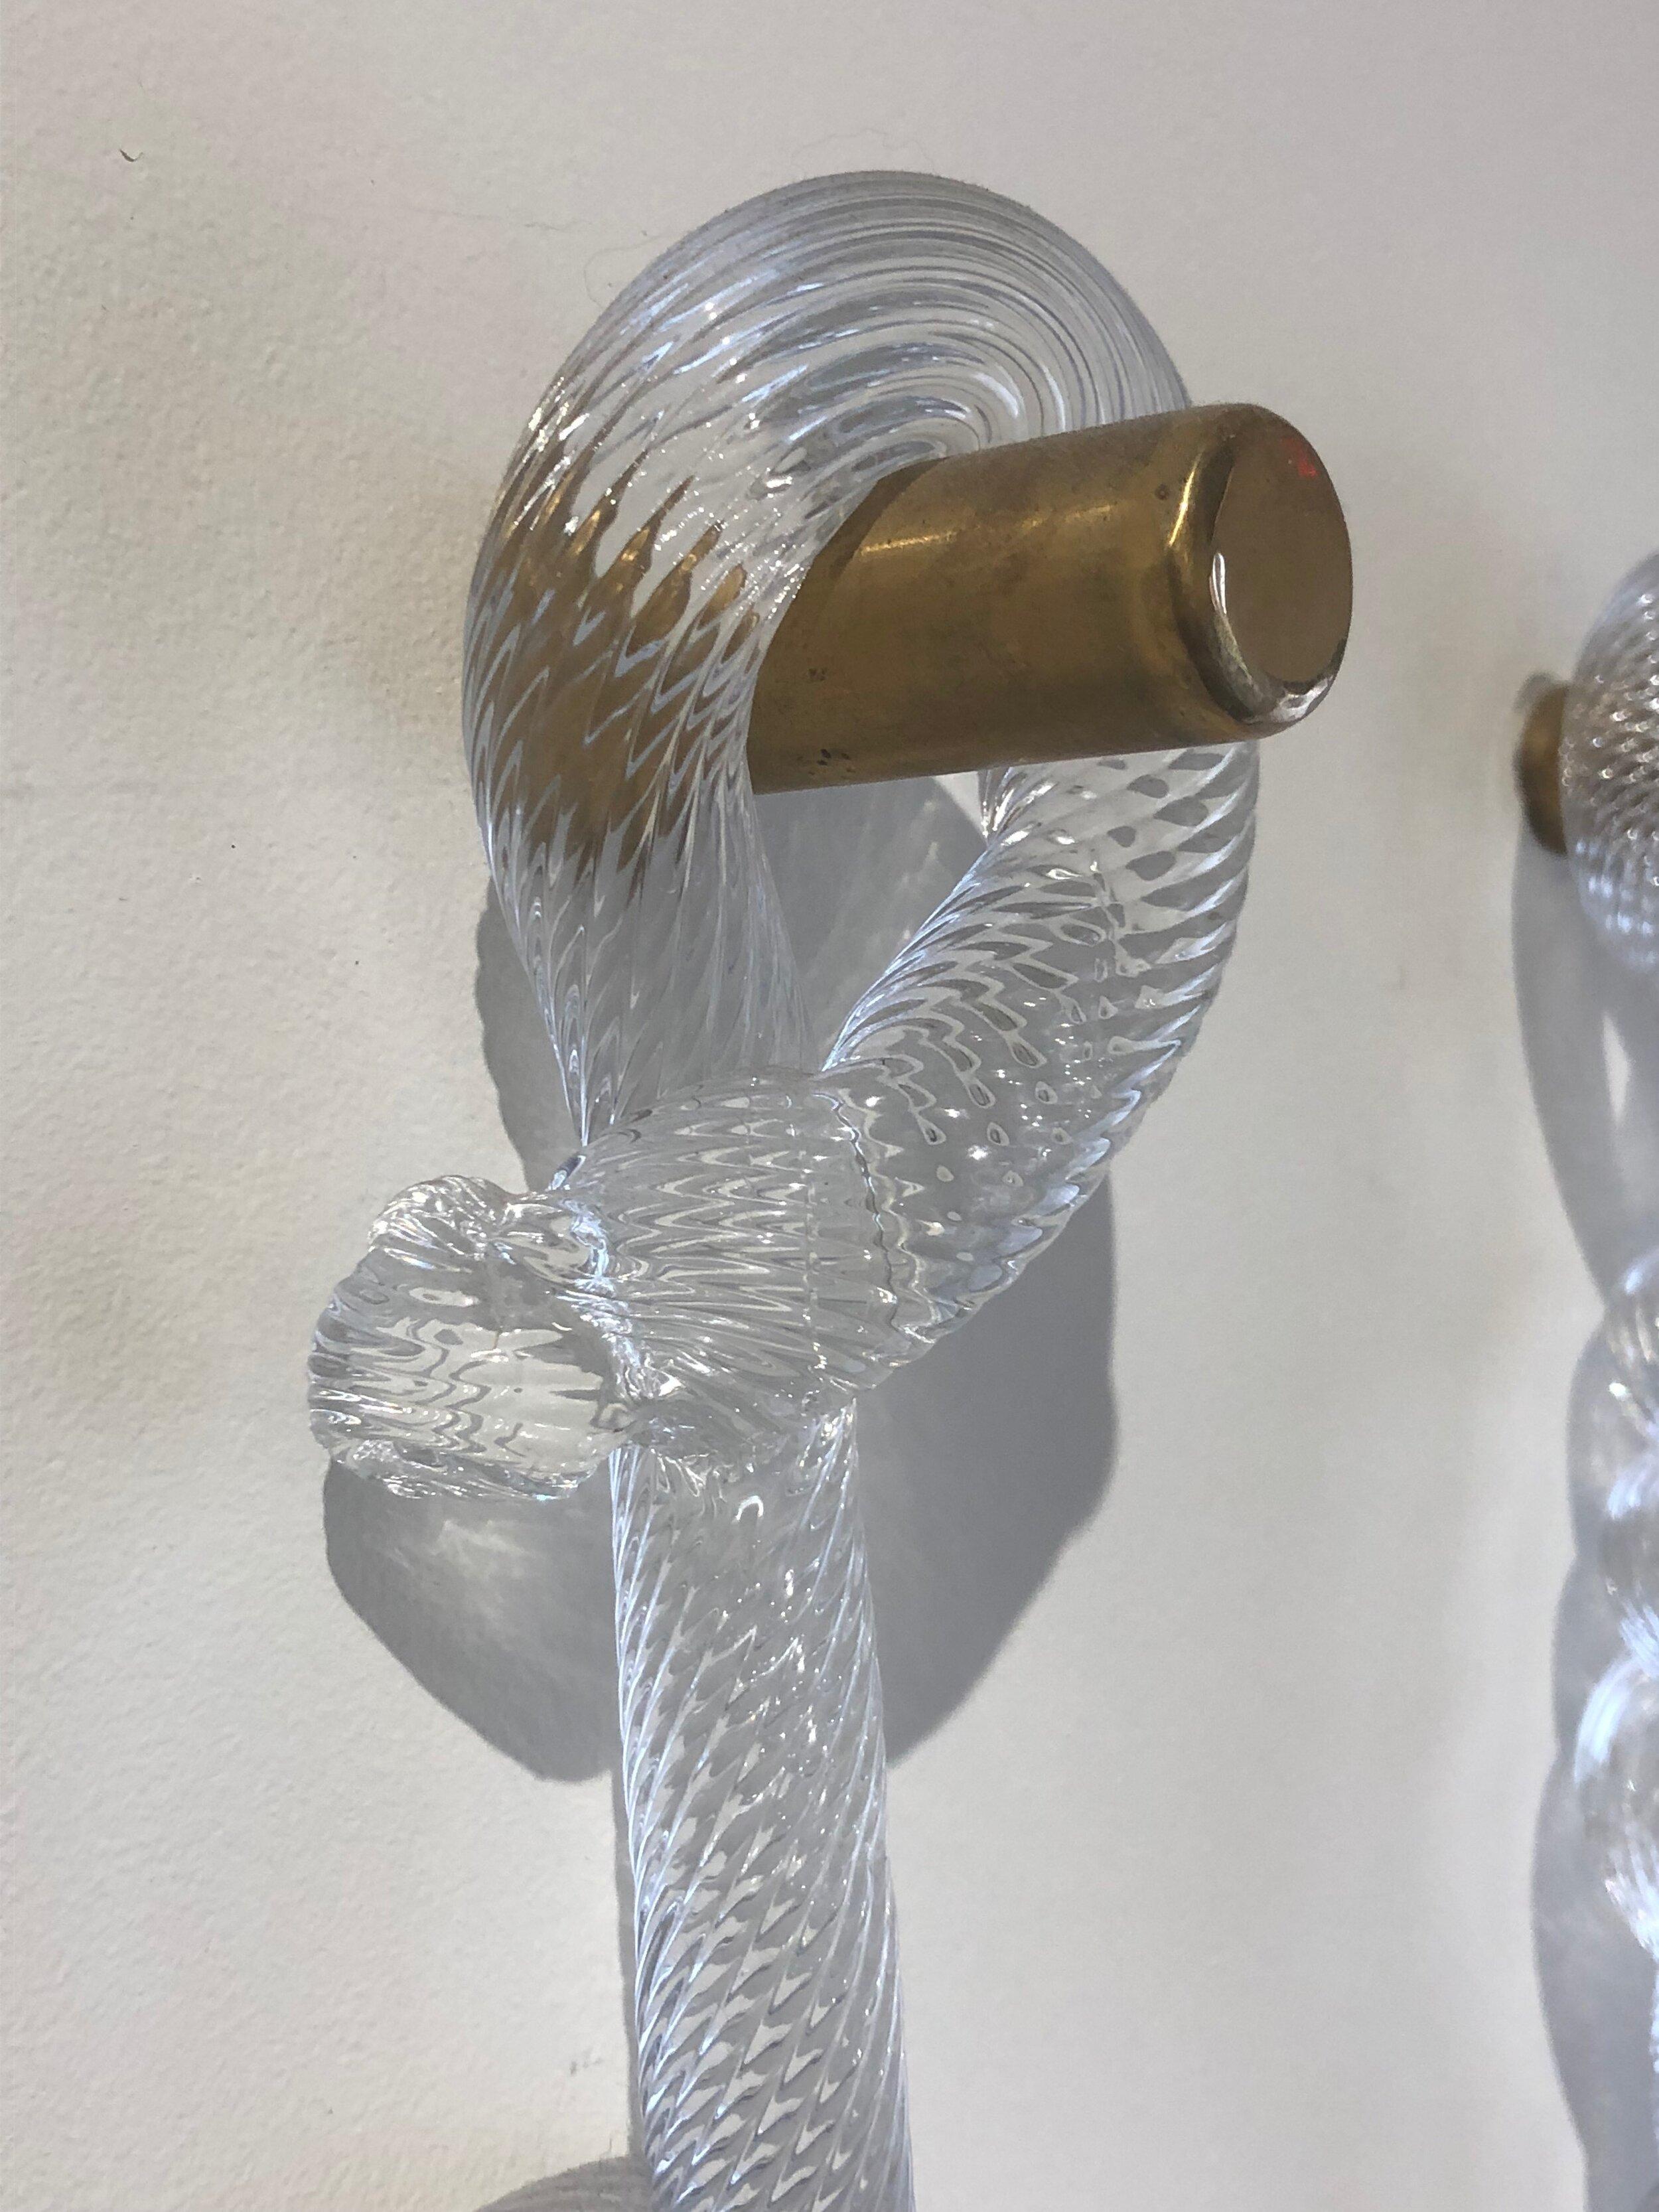 "Melanie Miller, Lover, Glass, Solid Brass Hardware 20""t x 7""w x 4"" D Hot Sculpted Glass at LVA's Life on the River"